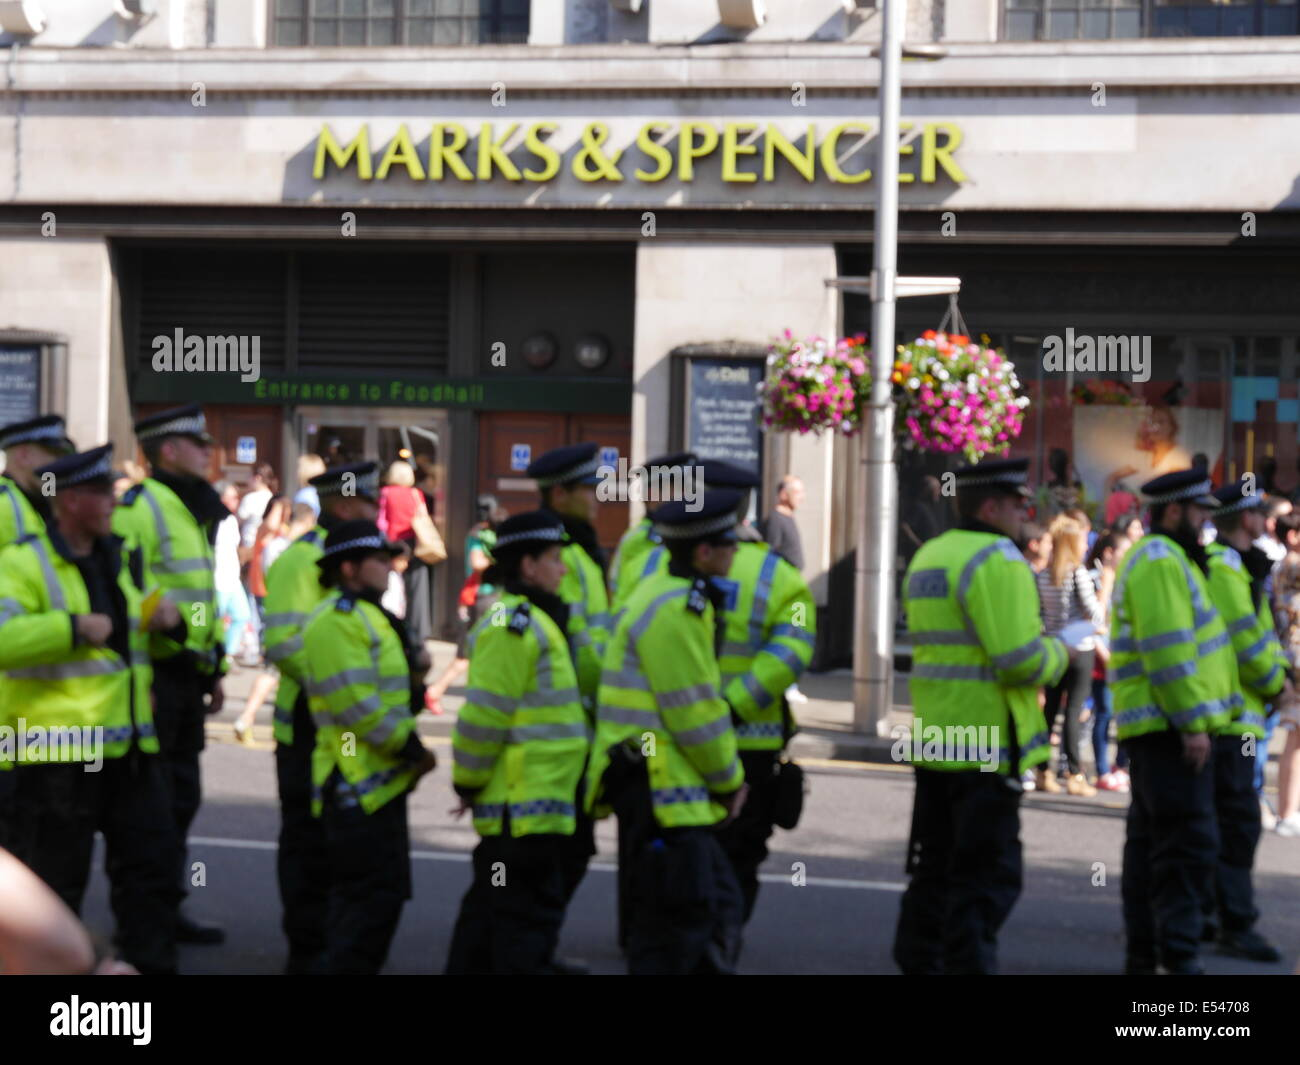 1994 London Israeli Embassy bombing